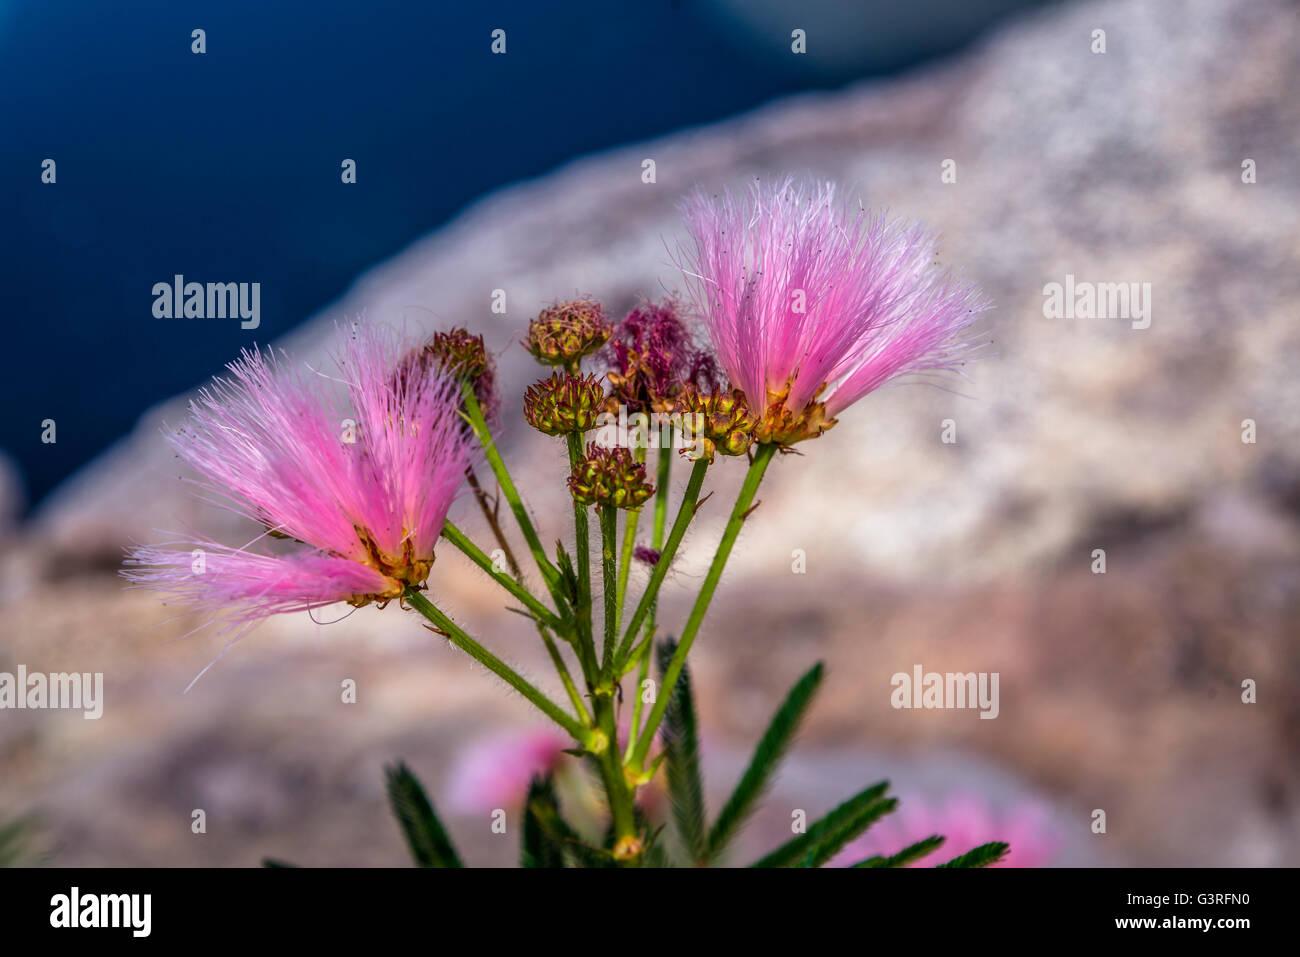 Calliandra flower, Chapada Diamantina, Bahia, Brazil - Stock Image